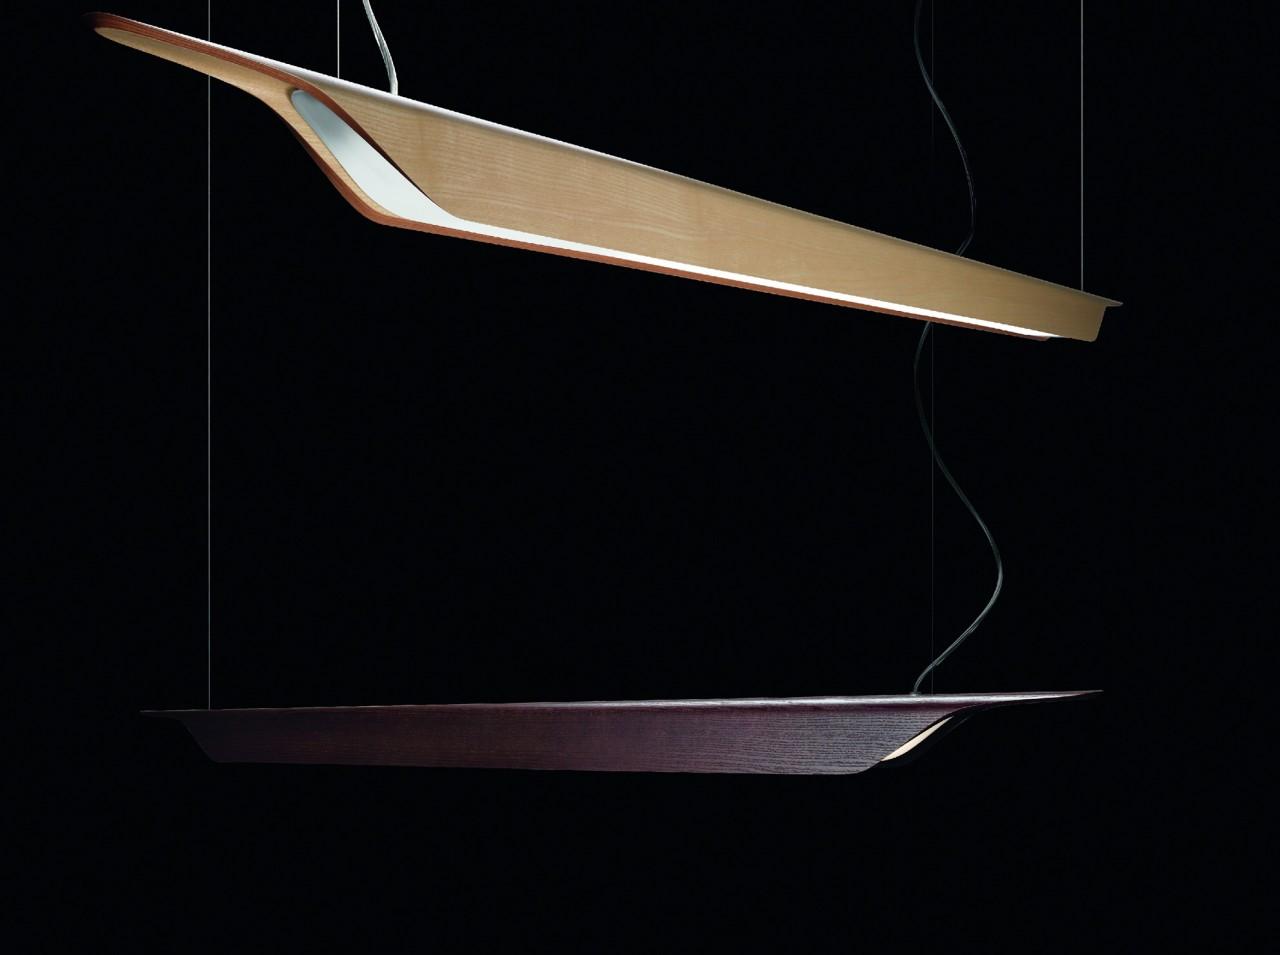 foscarini troag grande lampada a sospensione g5 2050071 50. Black Bedroom Furniture Sets. Home Design Ideas